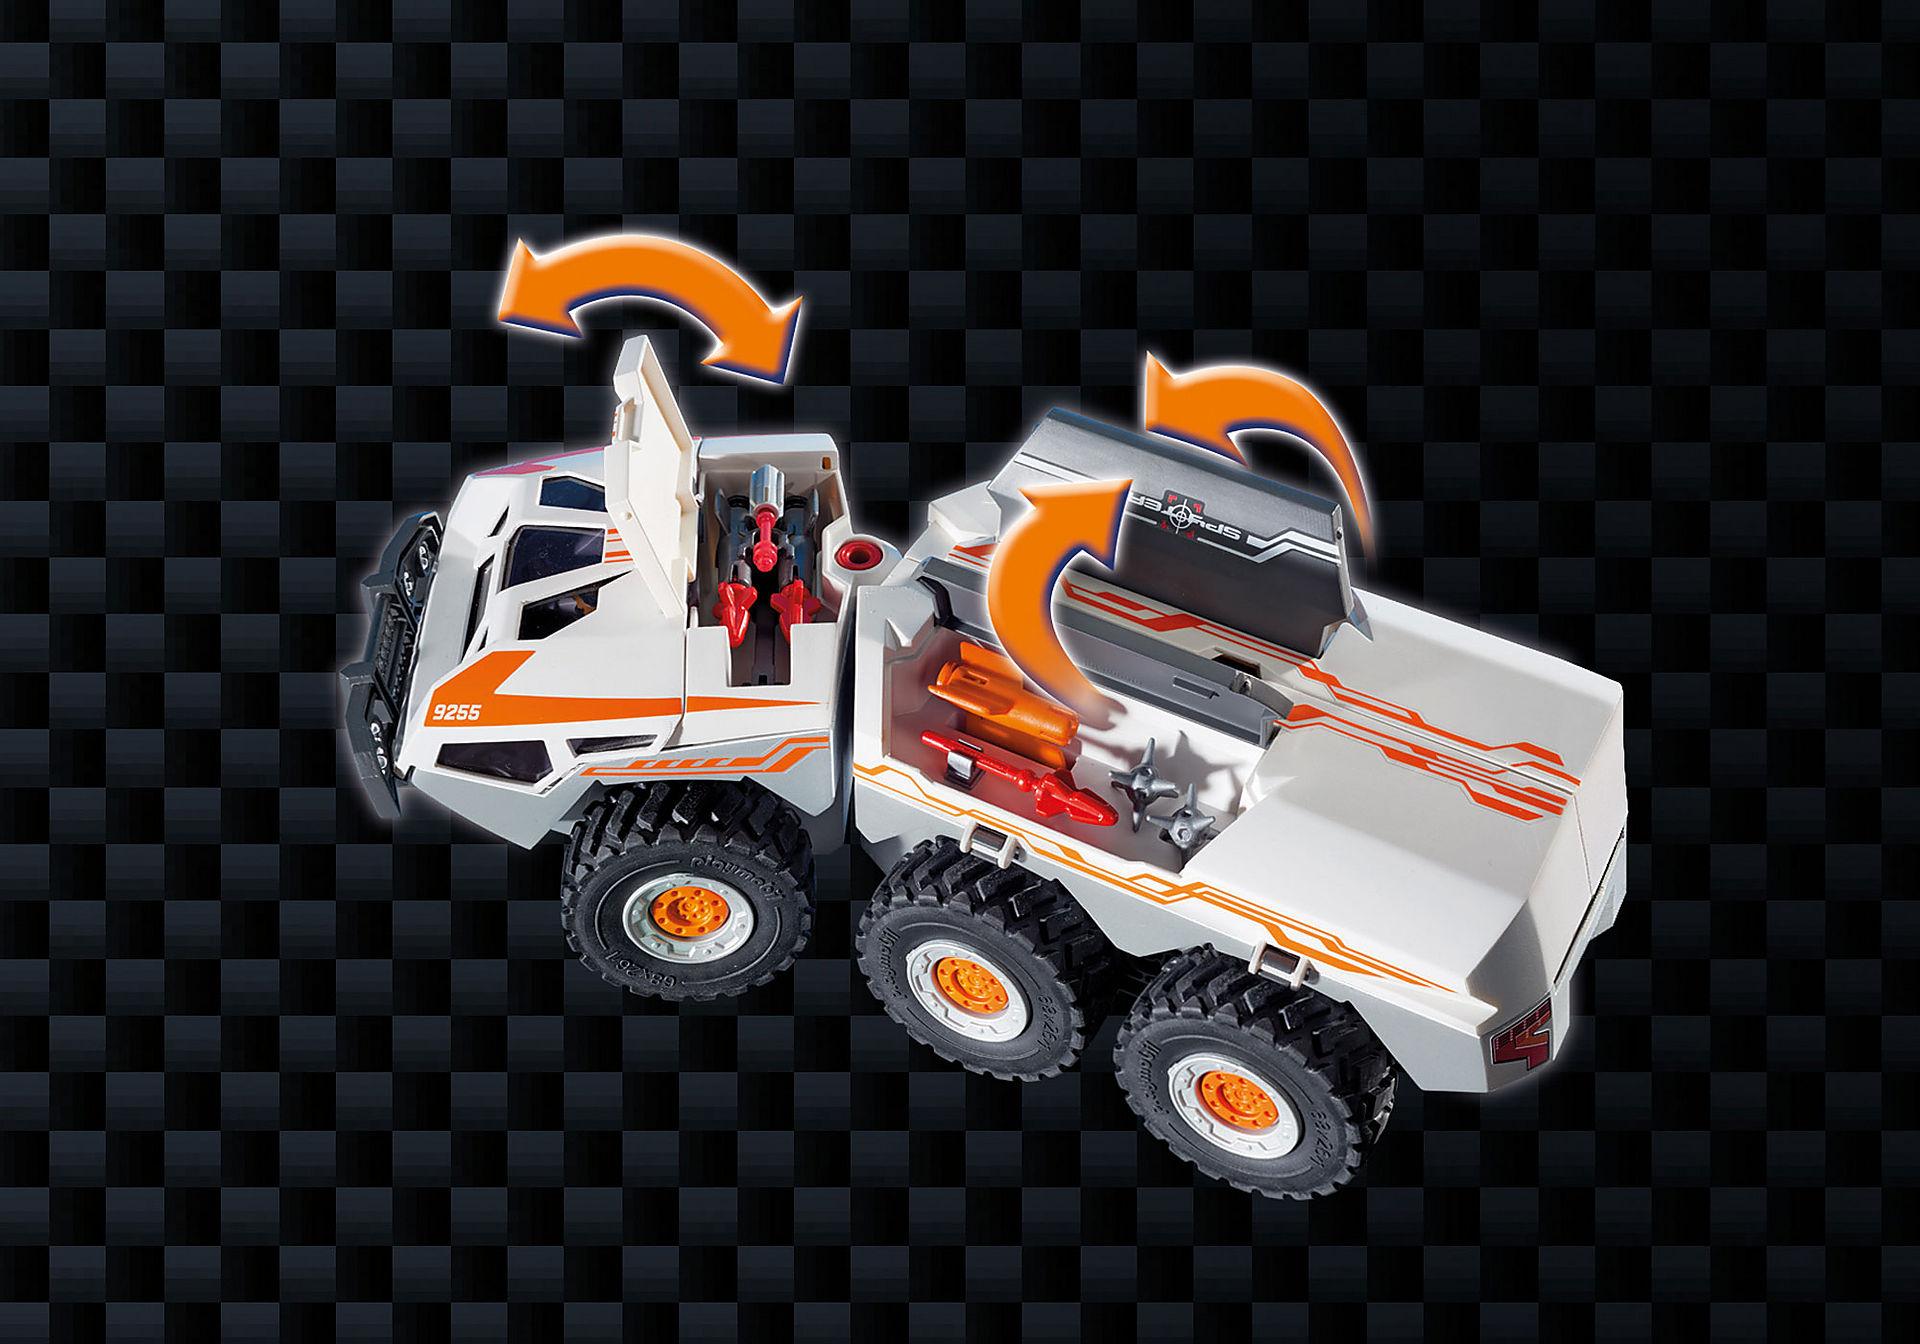 http://media.playmobil.com/i/playmobil/9255_product_extra5/Wehikuł bojowy Spy Team